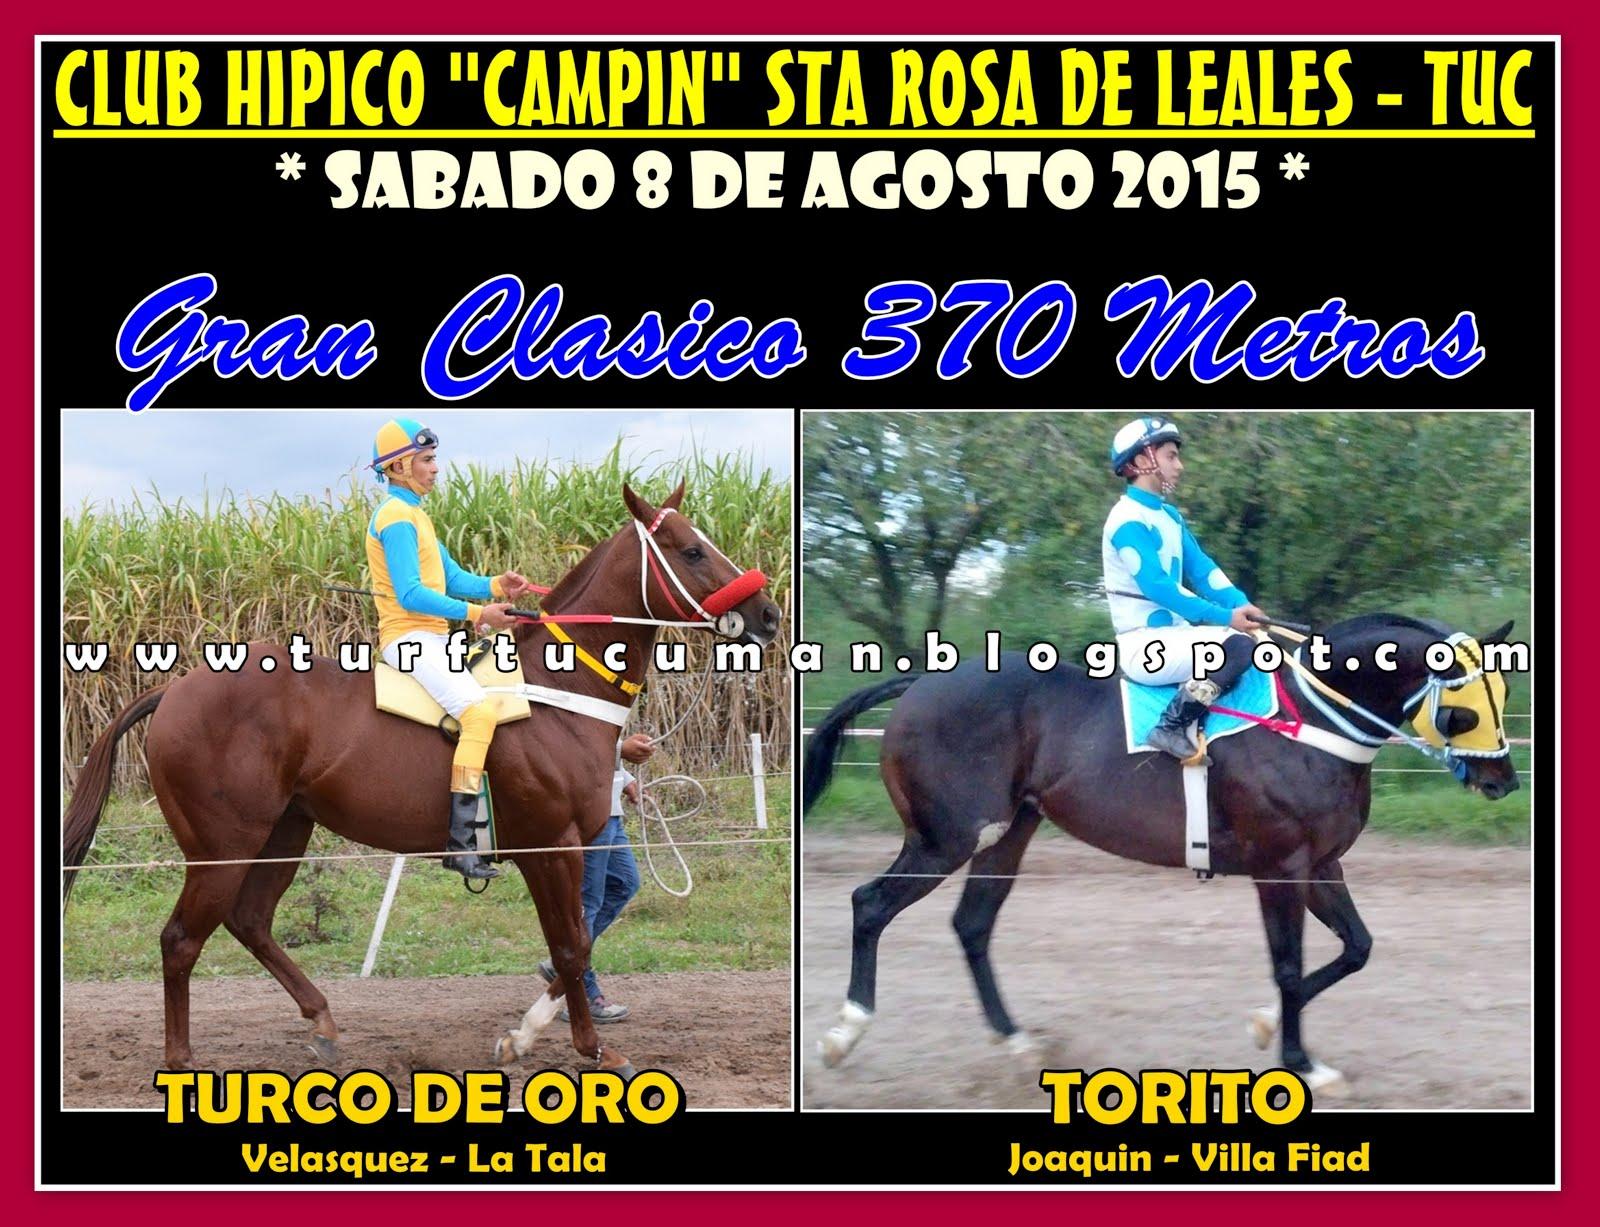 TURCO VS TORITO